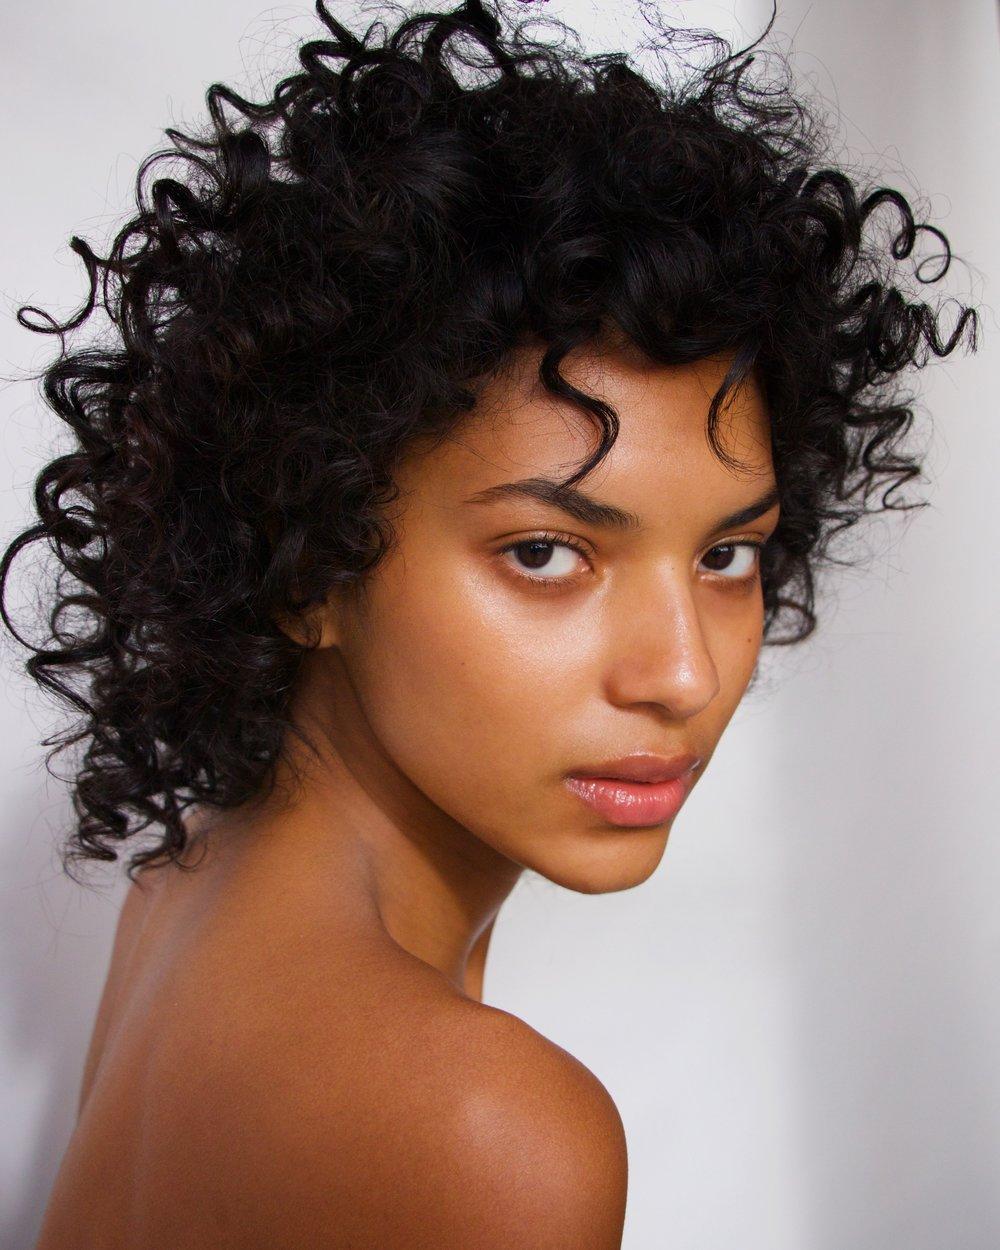 Beauty-Editorial 050 21-31-172017-02-19.jpg